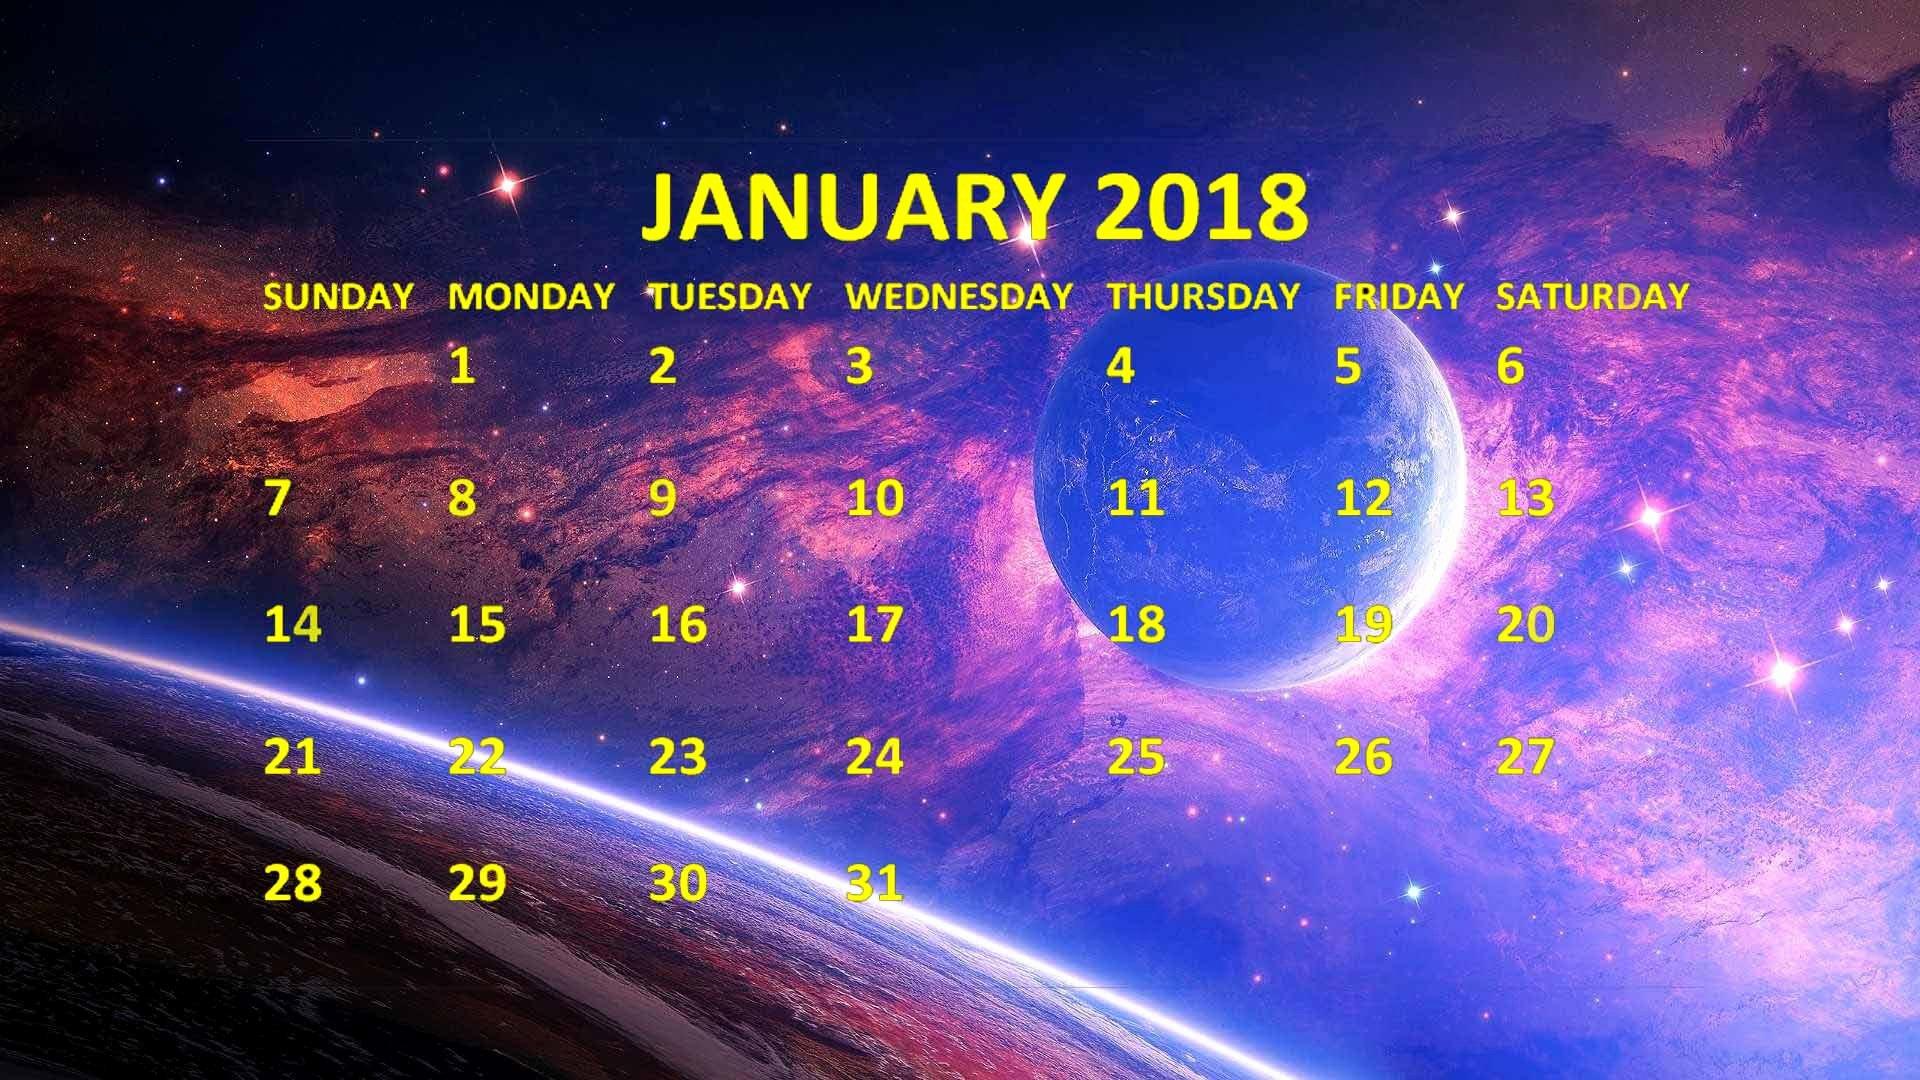 Suze orman Promissory Note Elegant 10 Amazing January 2018 Nature Printable Calendars Free